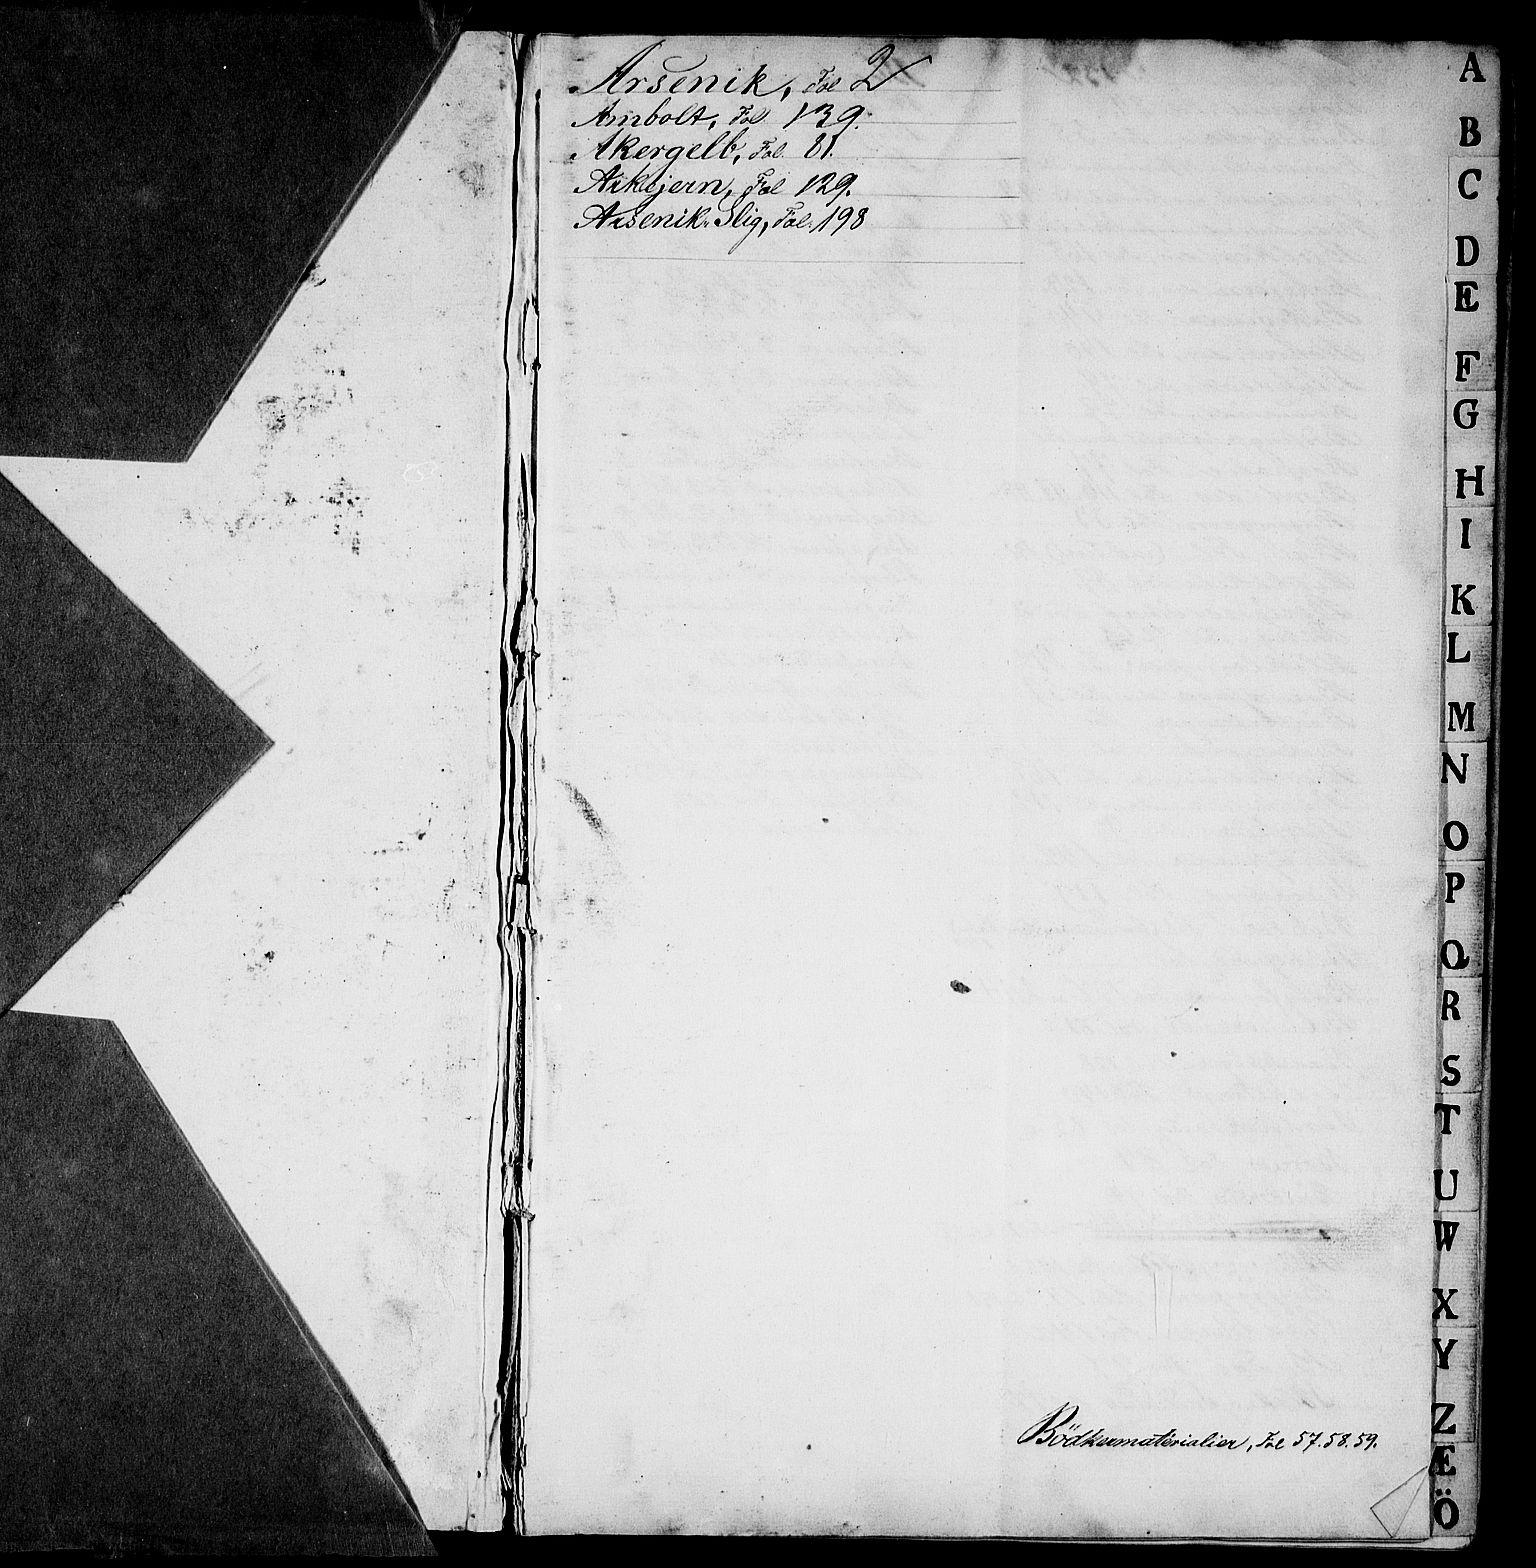 RA, Modums Blaafarveværk, G/Gd/Gdb/L0195: Materialbok, 1836-1839, s. 2